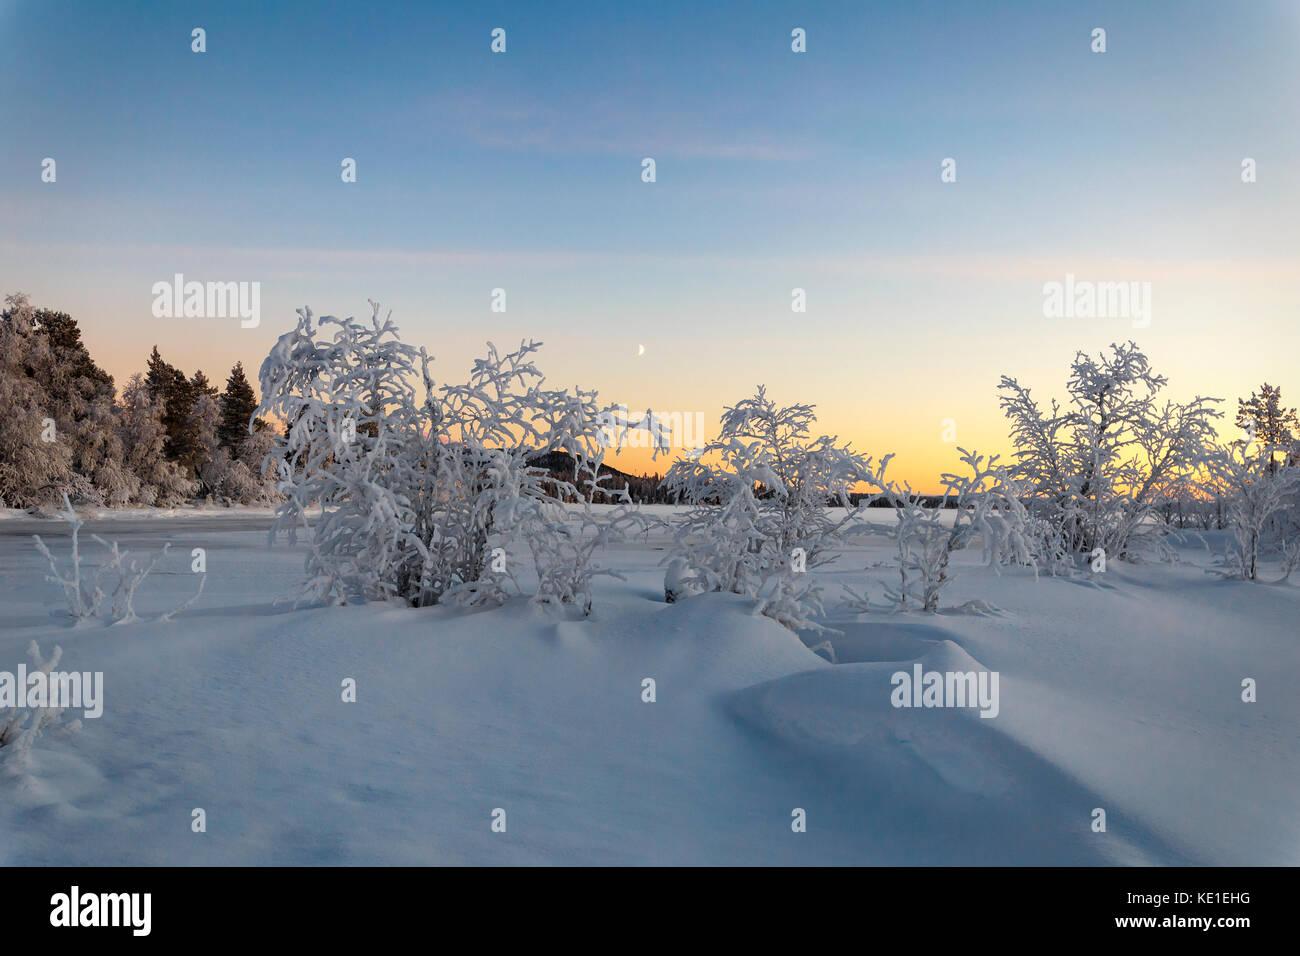 Bush on the frozen lake at sunset - Stock Image